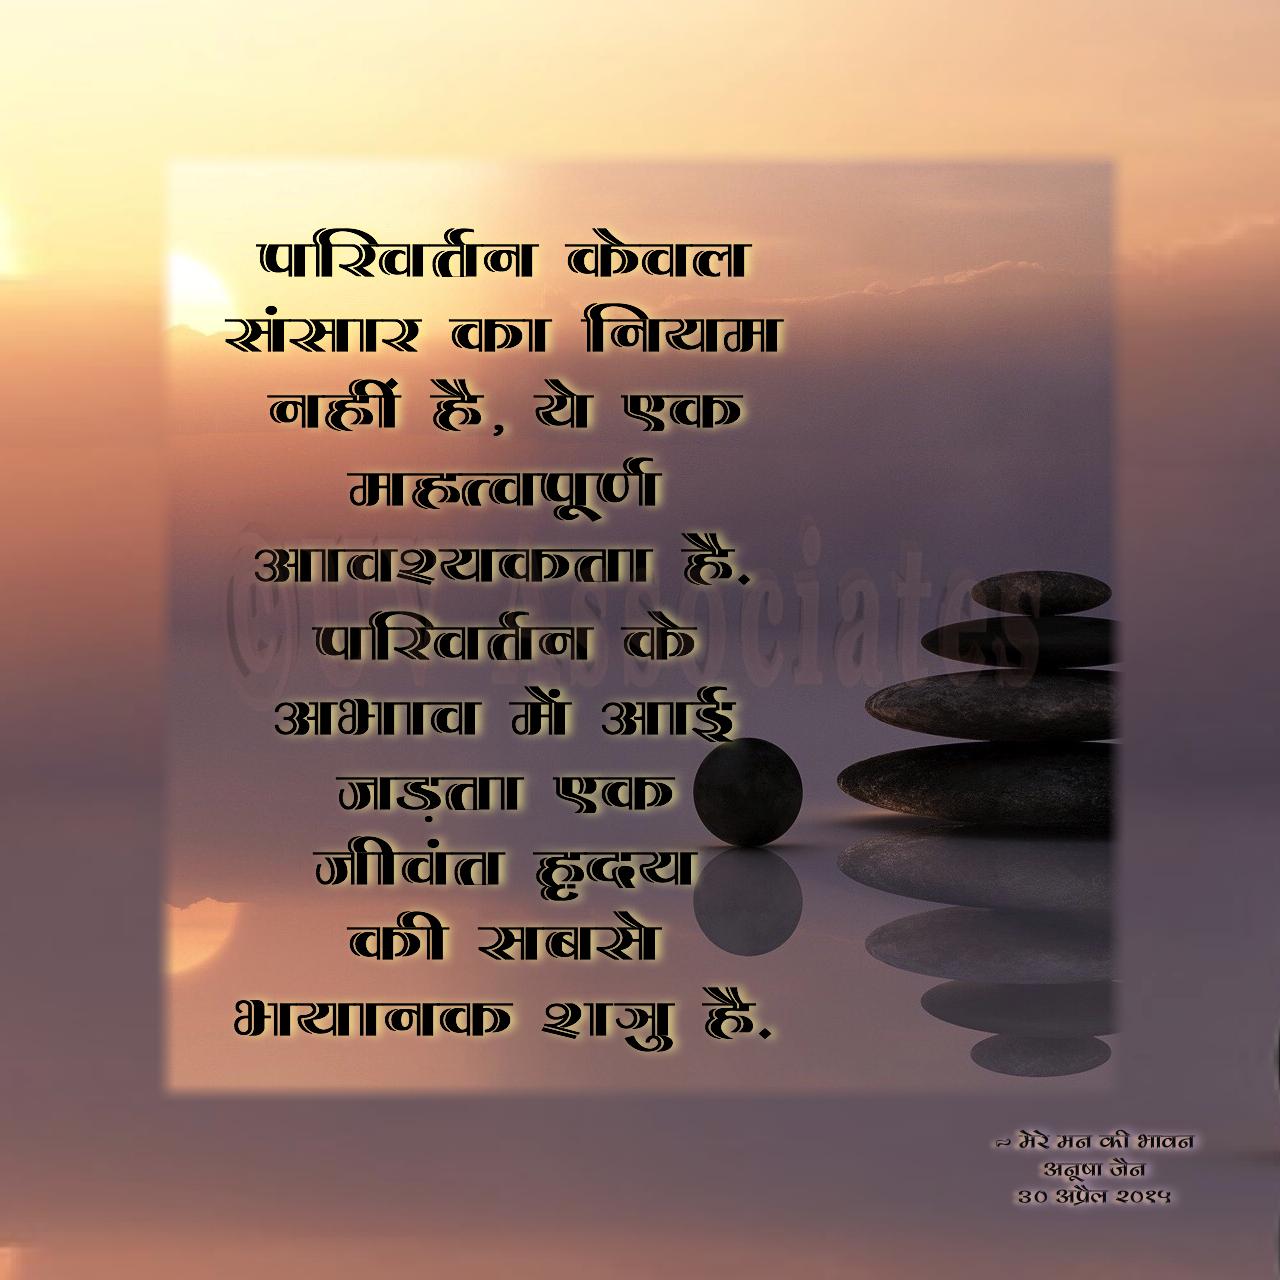 परिवर्तन - हिंदी कोट्स - Hindi quote image about change